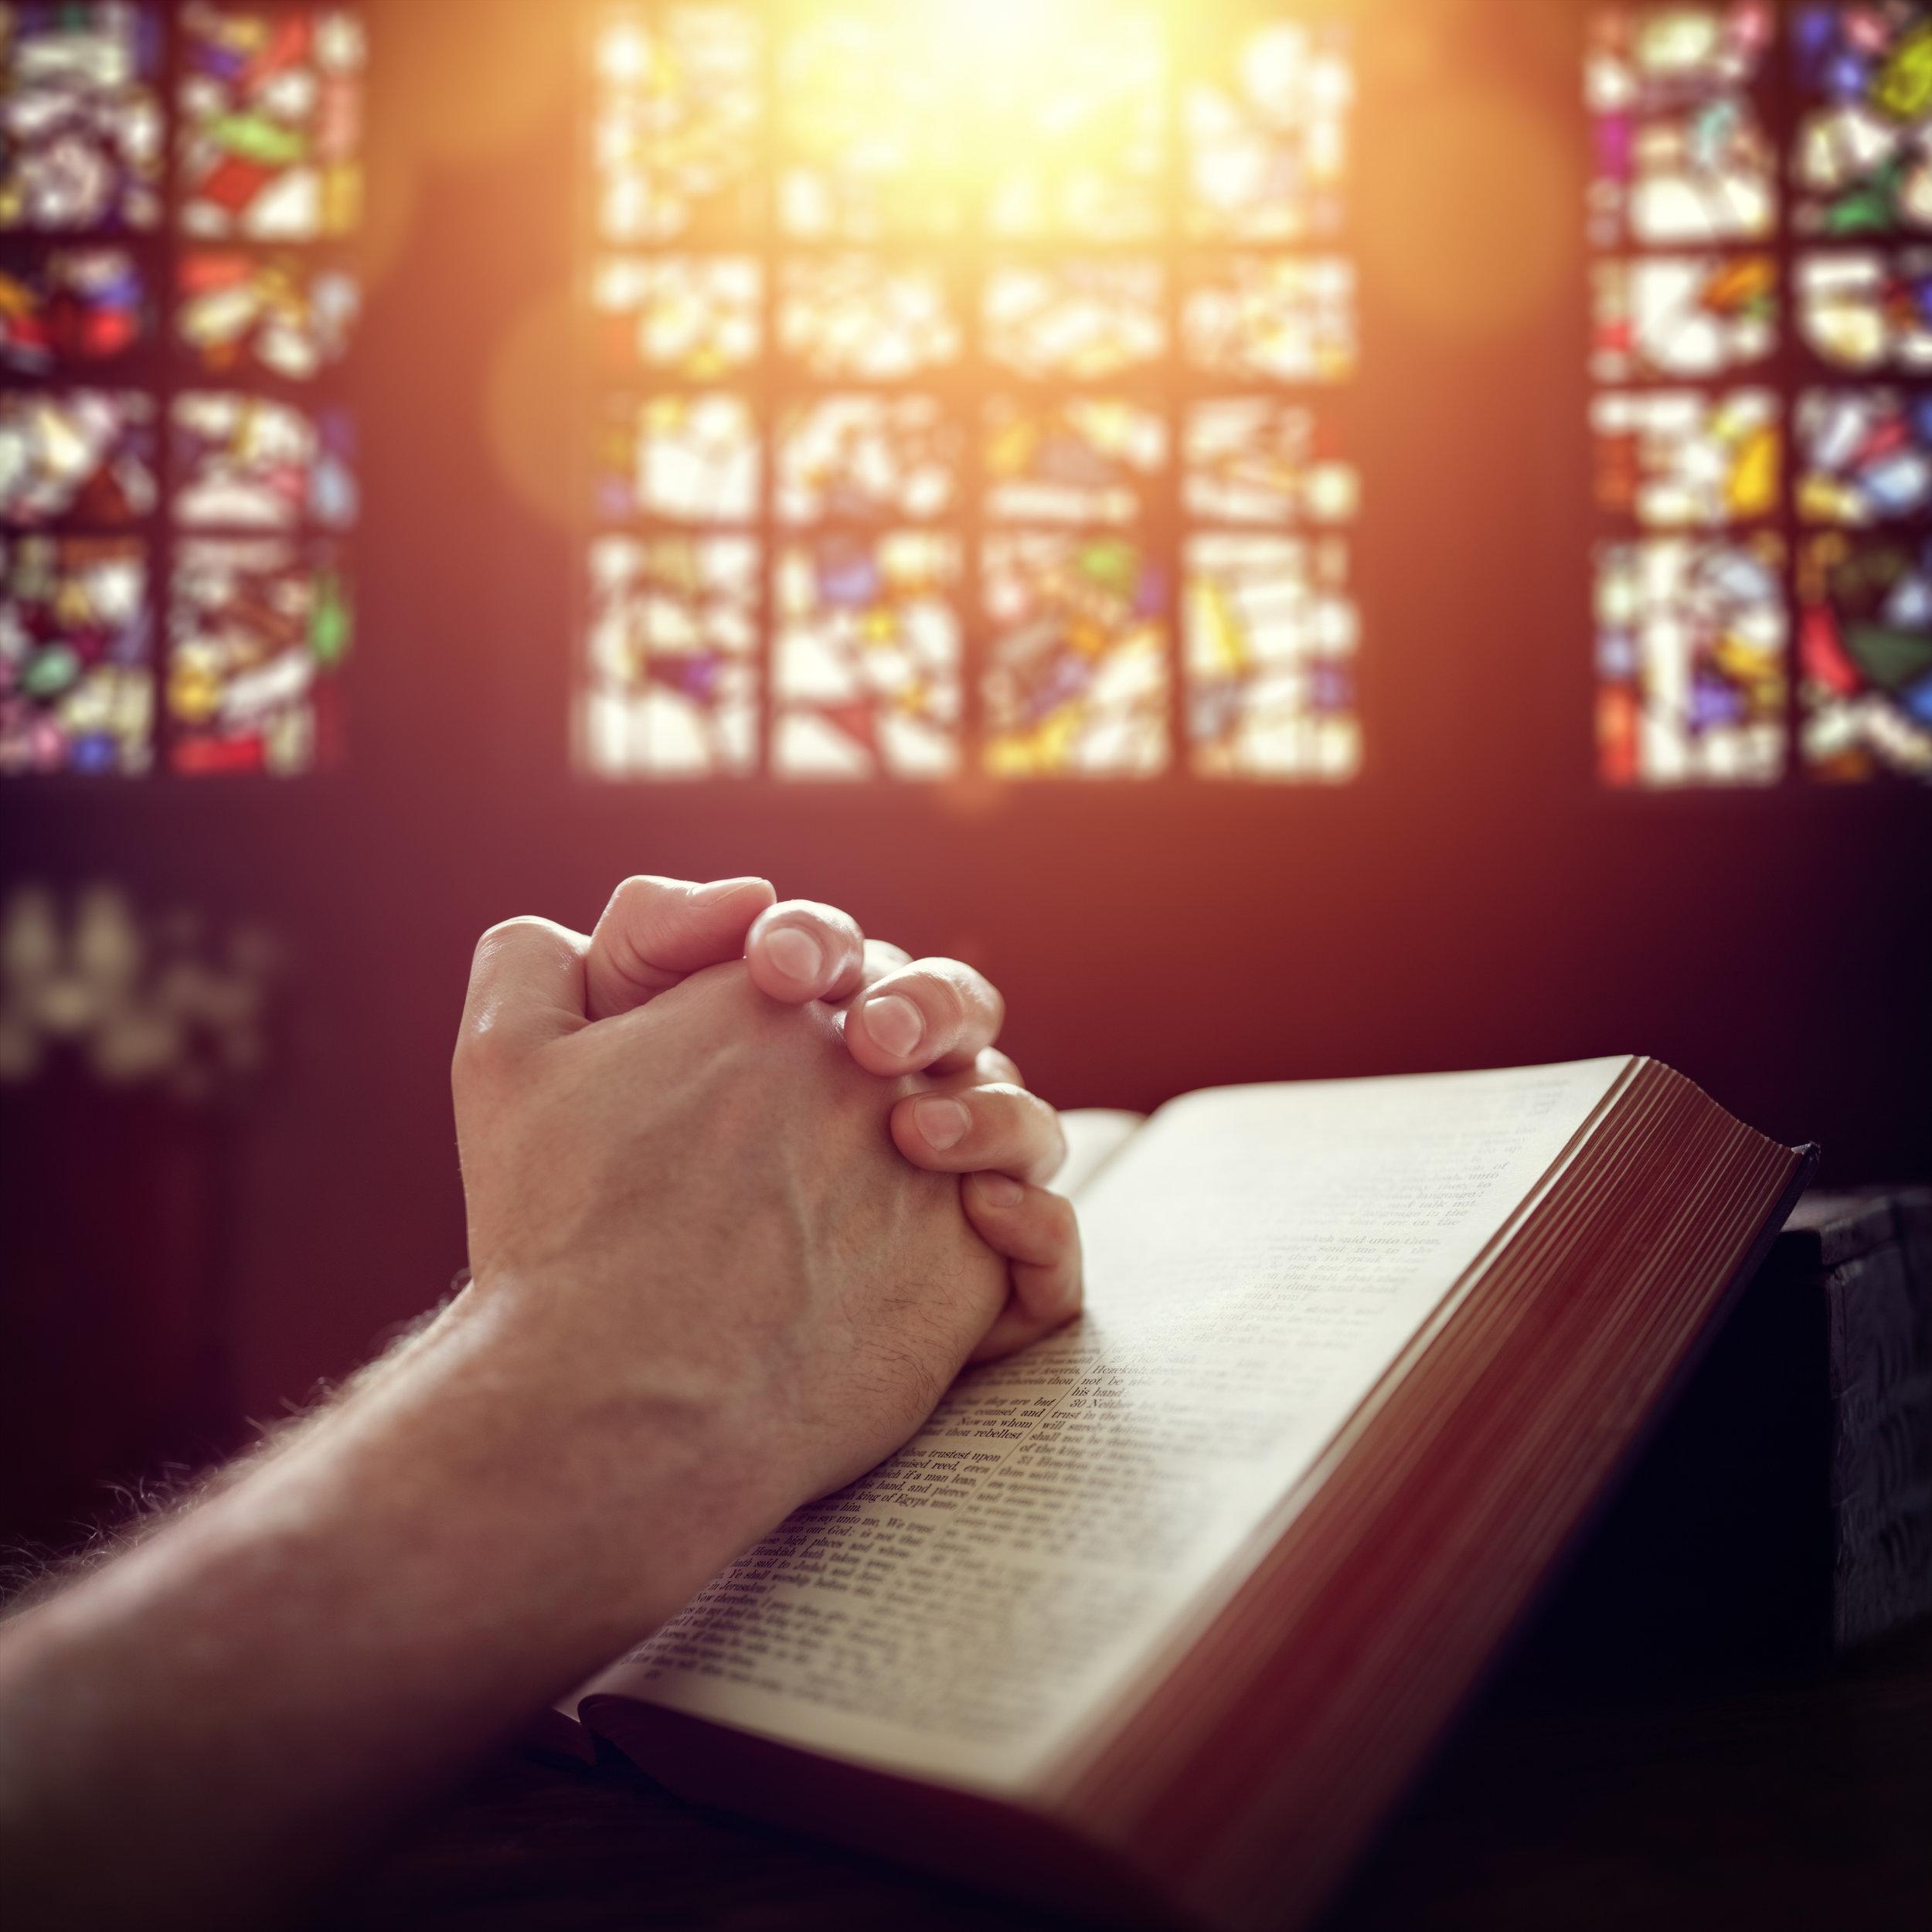 Praying-hands-on-a-Holy-Bible-505067134_3159x3159.jpeg